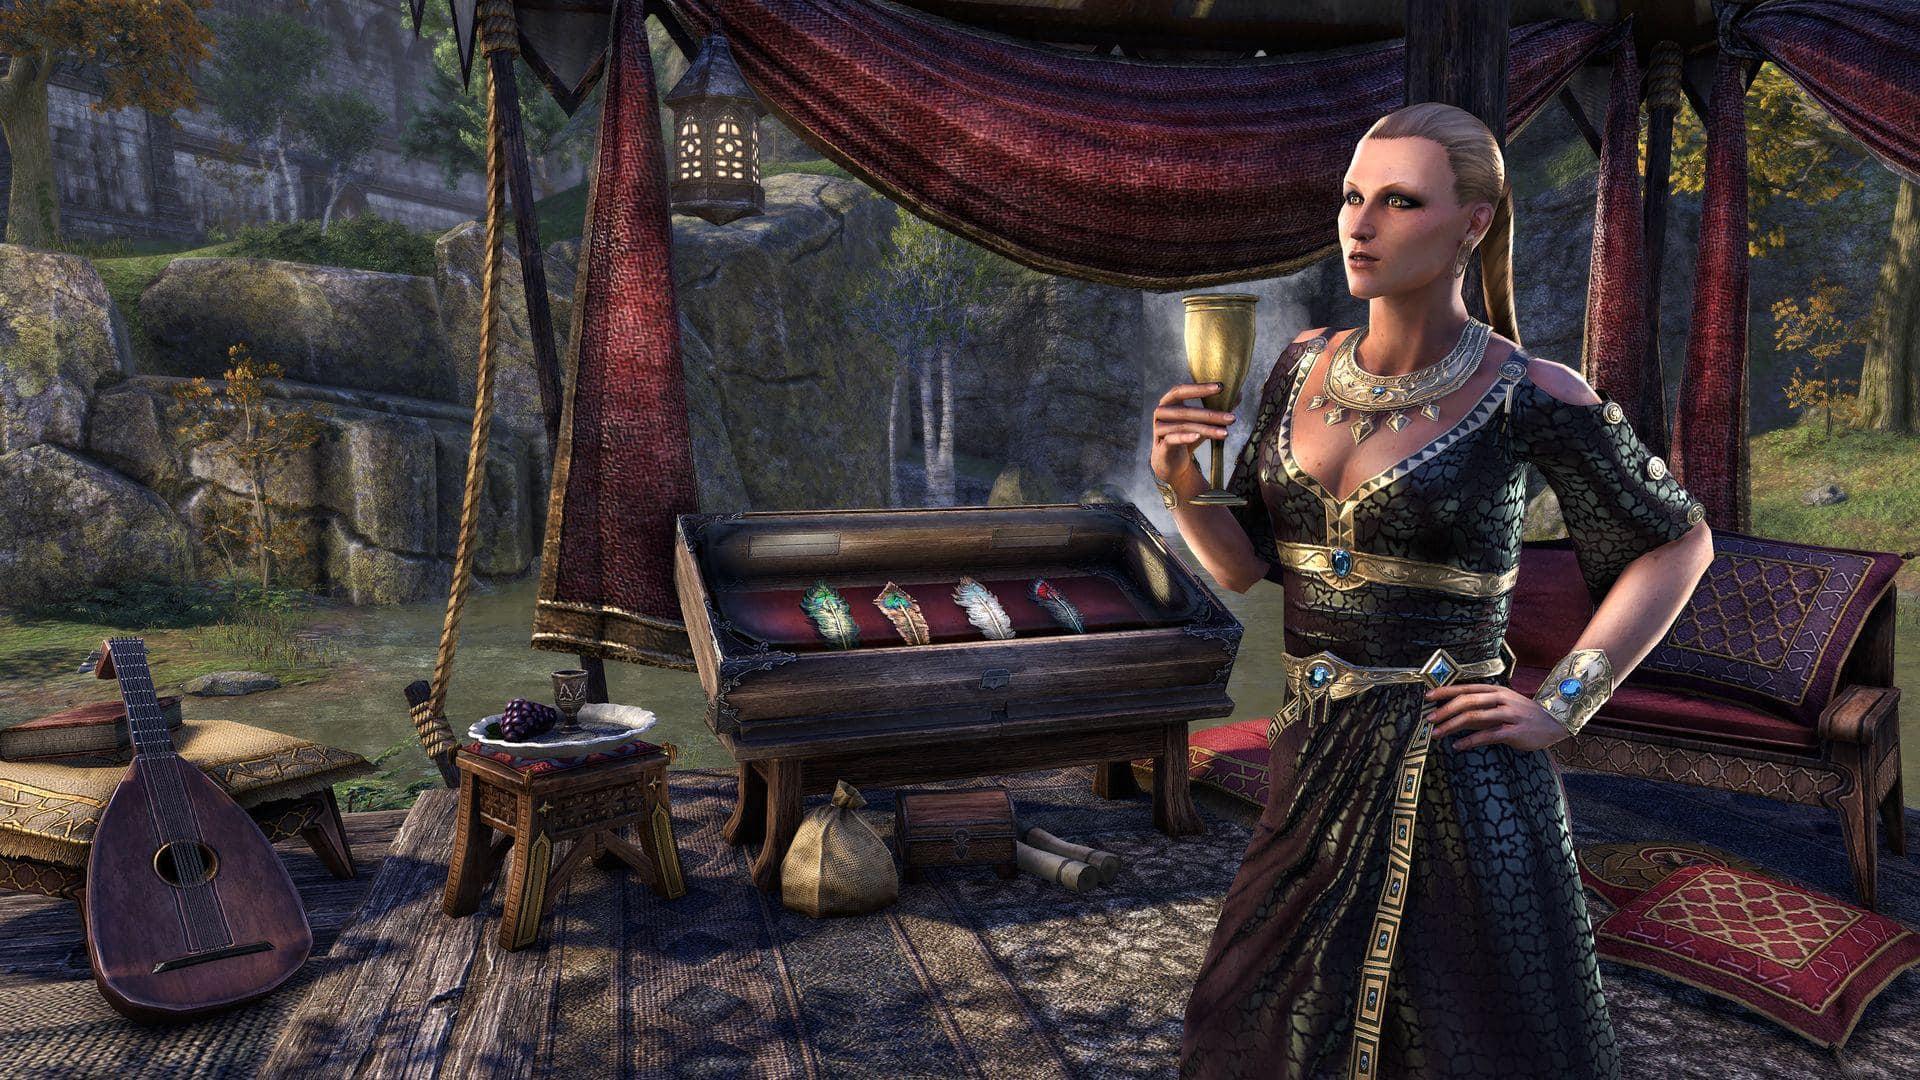 Elder Scrolls Online Halloween Guide 2020 Guide to Event Tickets & Rewards   The Elder Scrolls Online